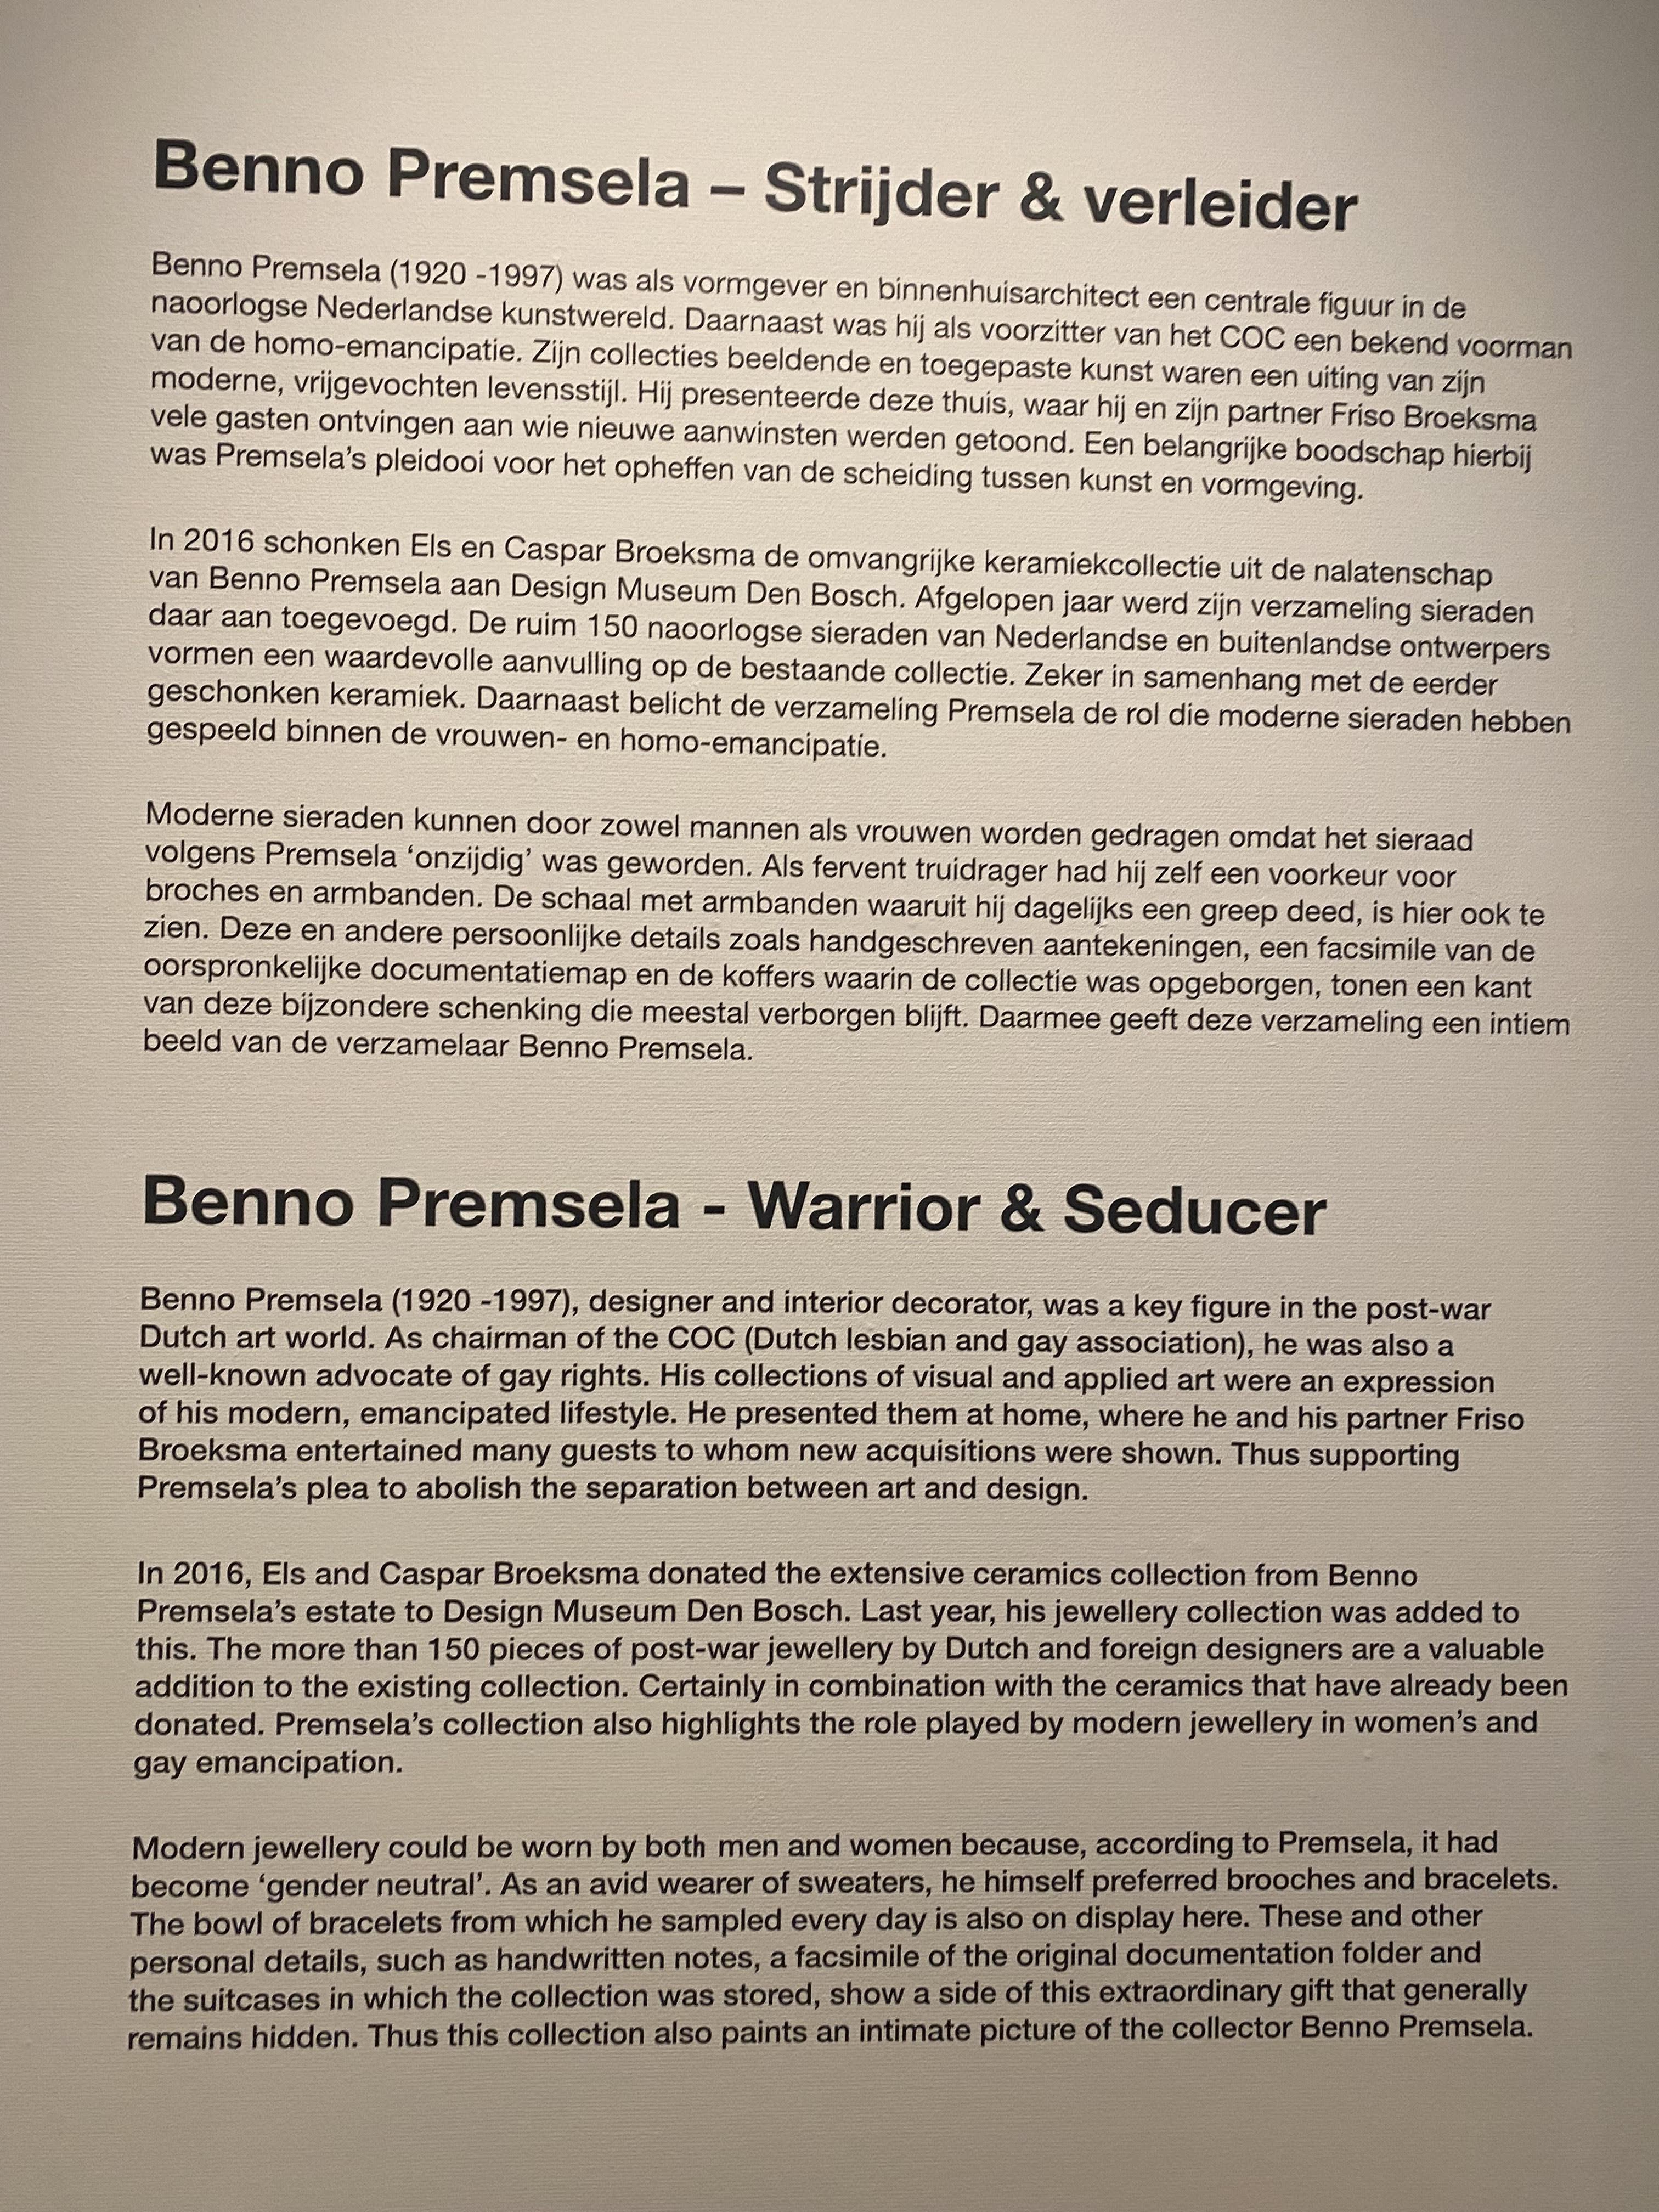 Collectie Benno Premsela, Design Museum Den Bosch, 2021. Foto Hans Appenzeller, tentoonstelling, wandtekst